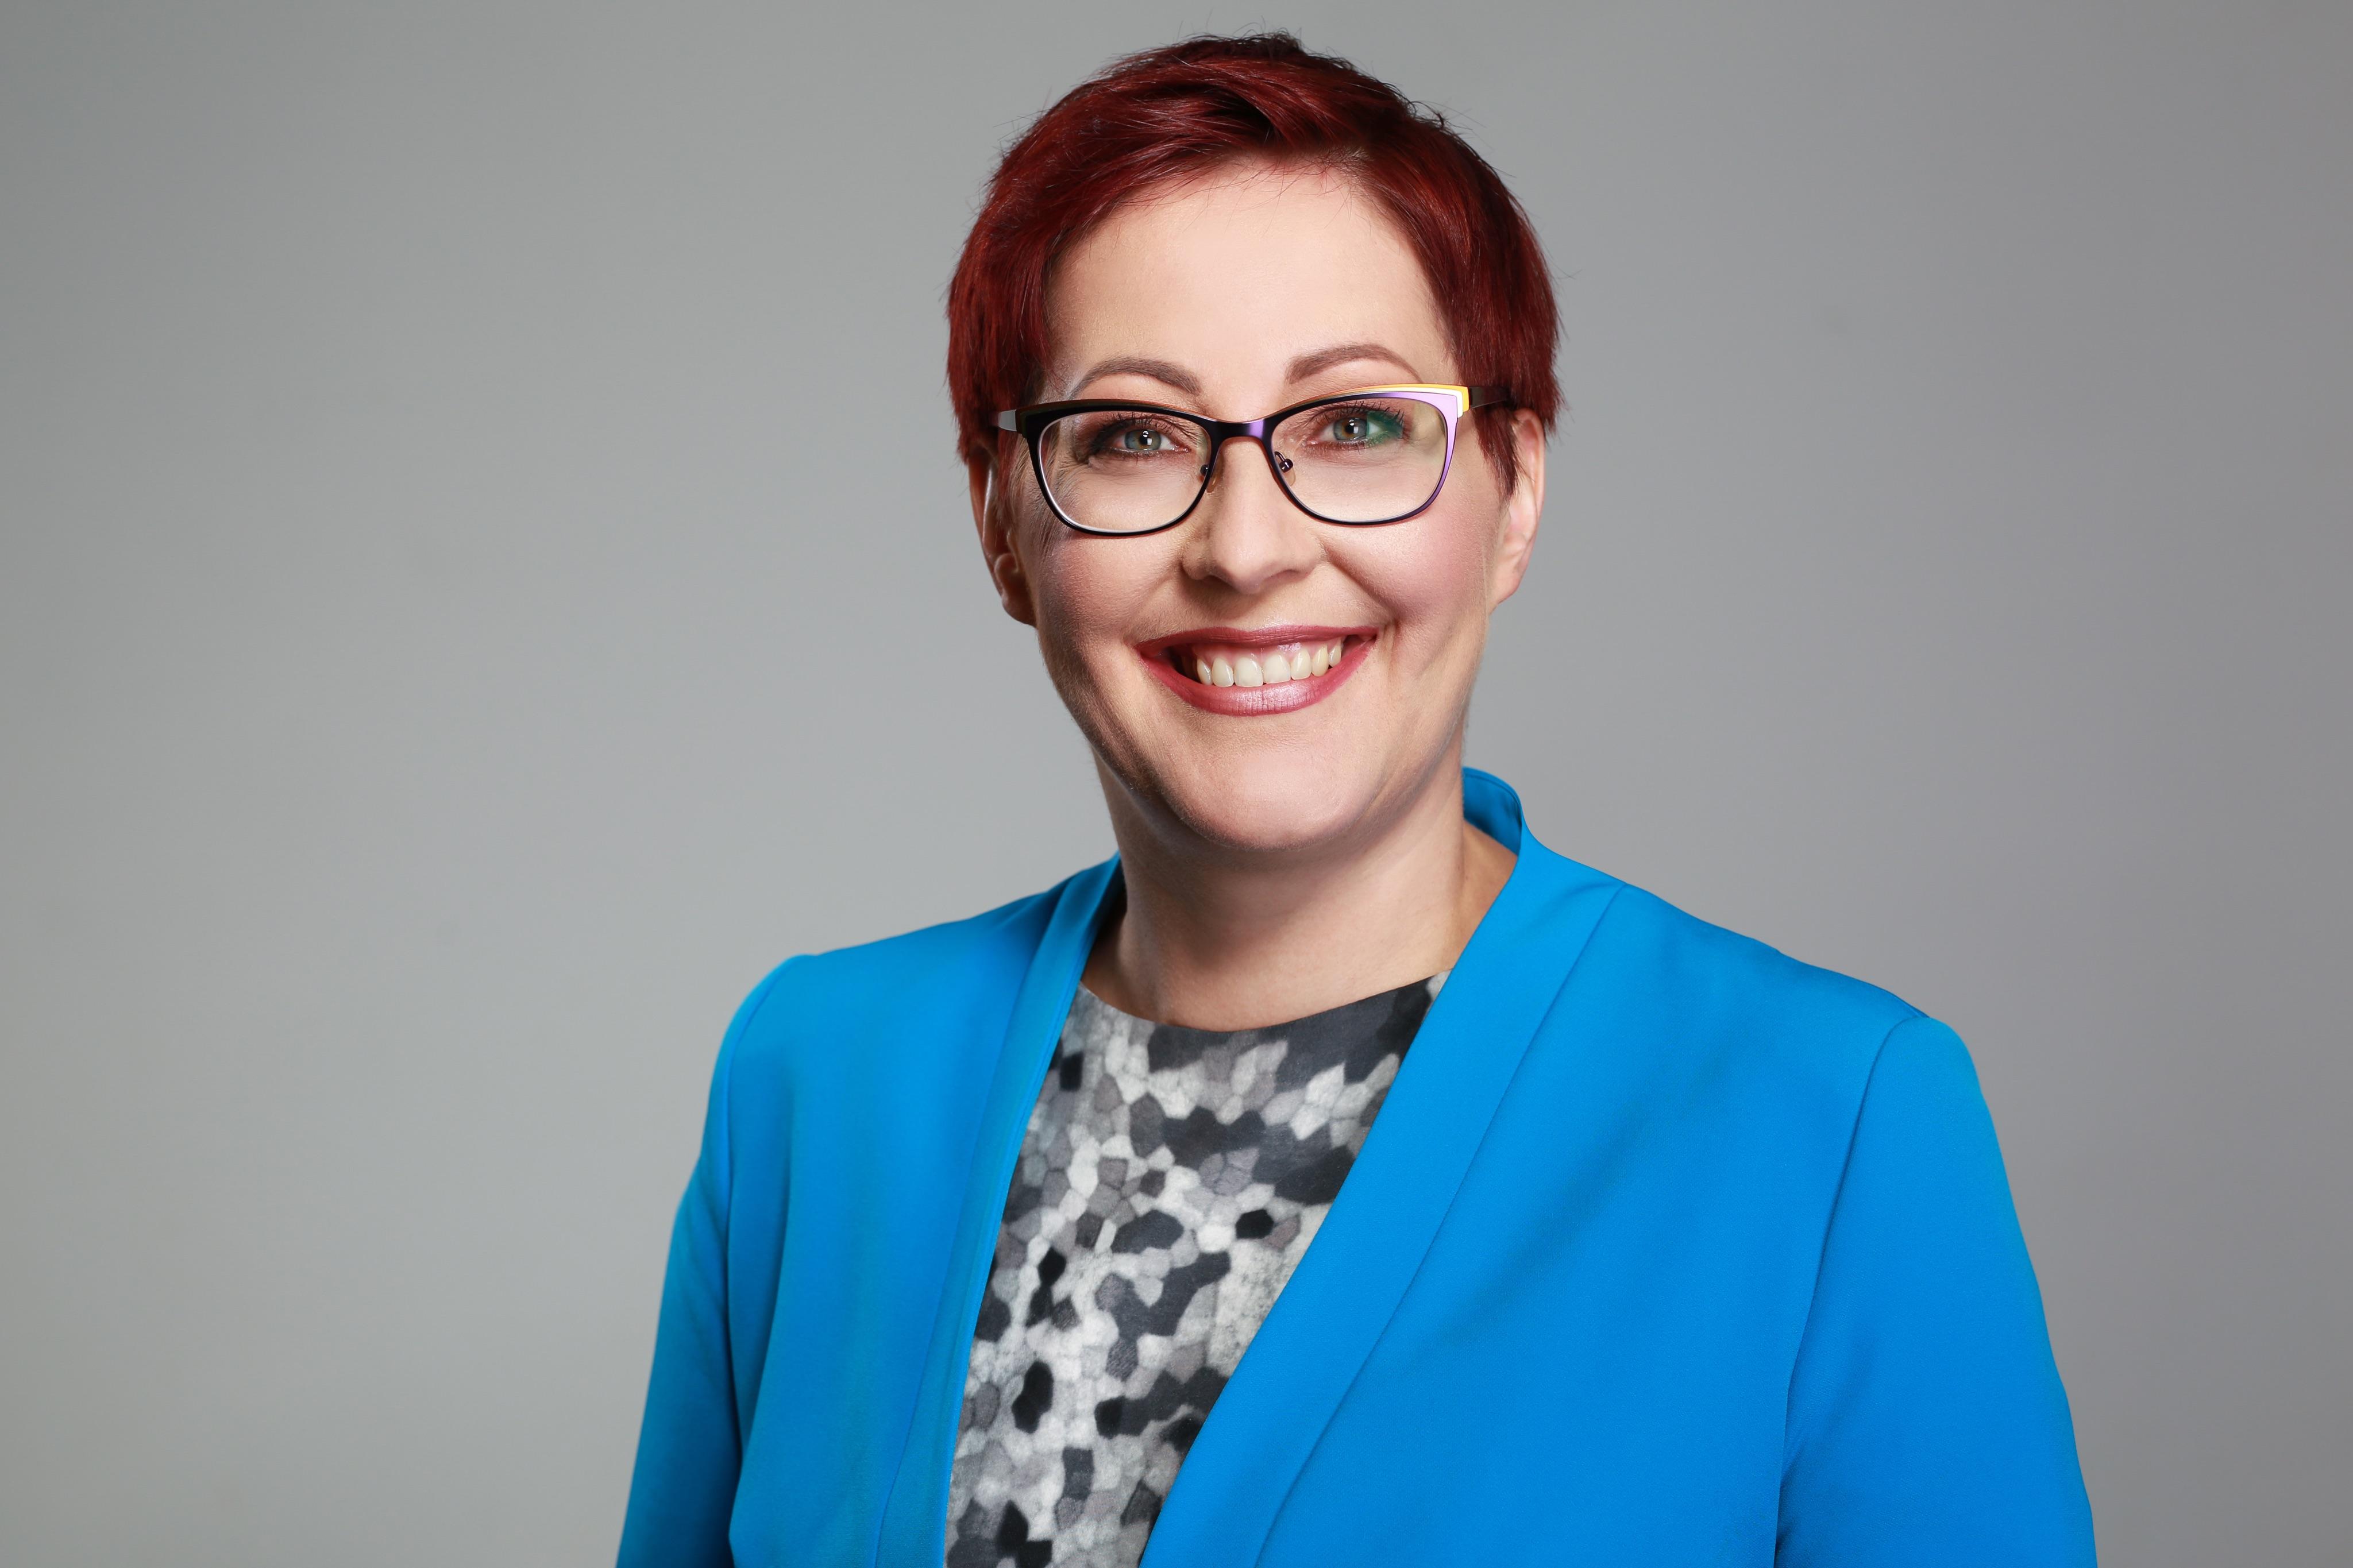 Małgorzata Brańska